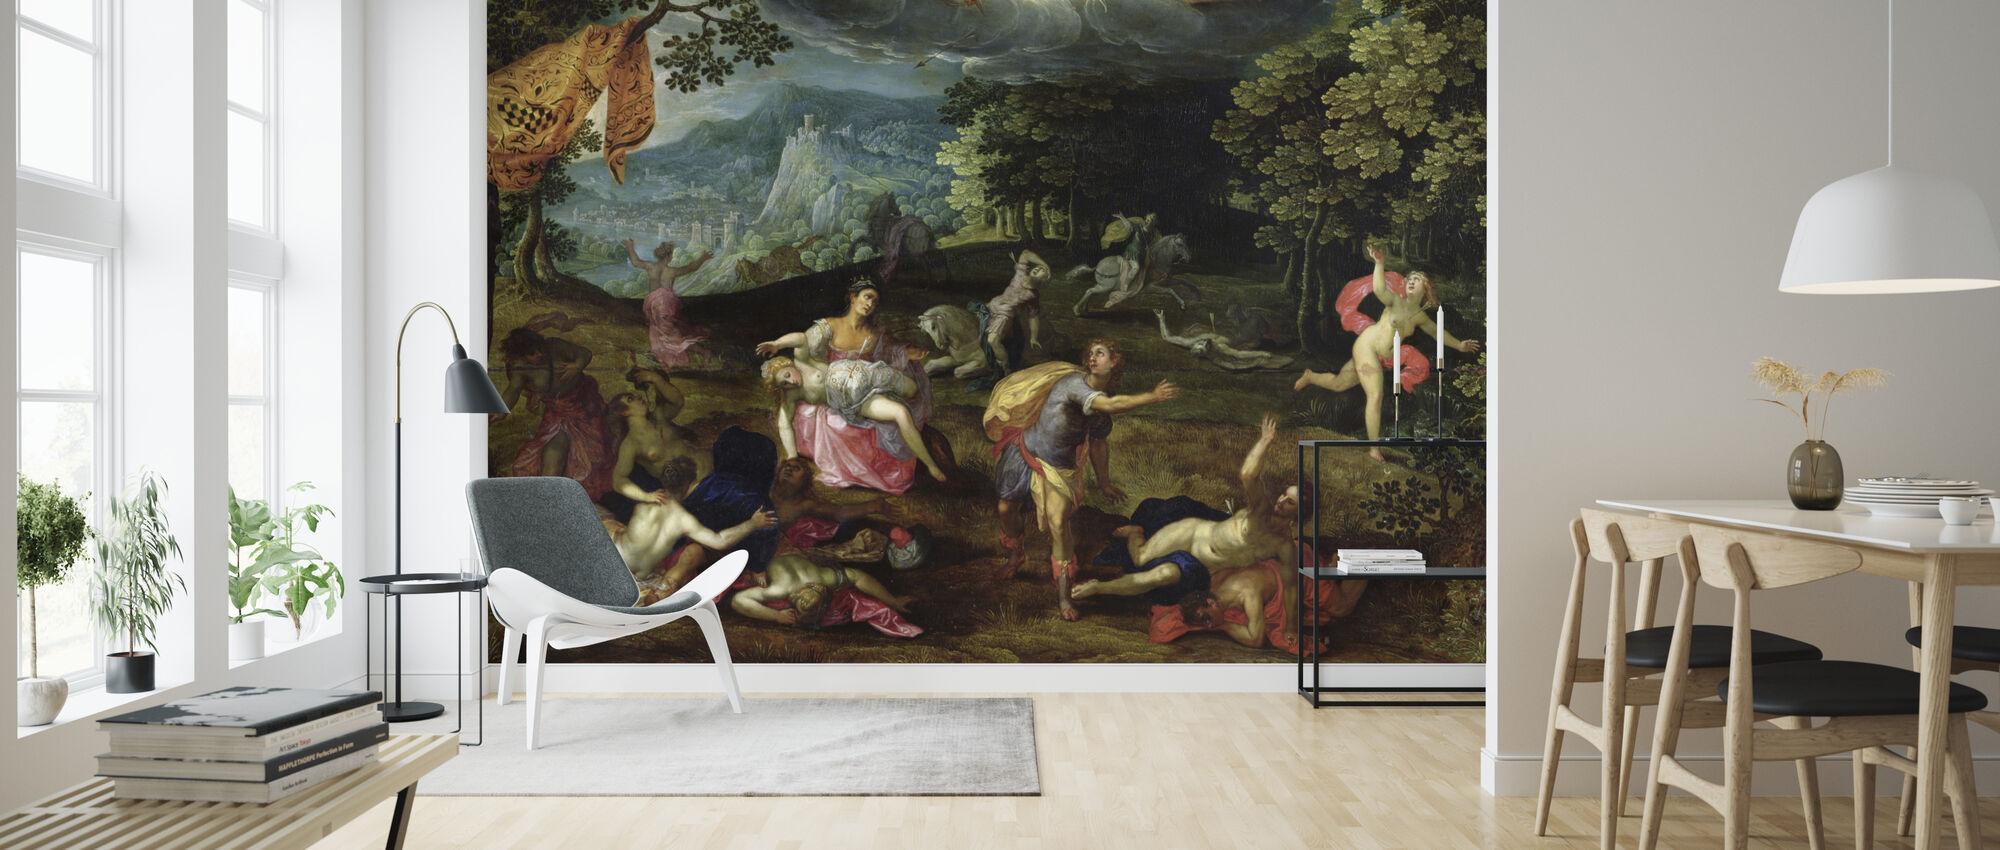 Punishment of Niobe - Tobias Verhaecht - Wallpaper - Living Room